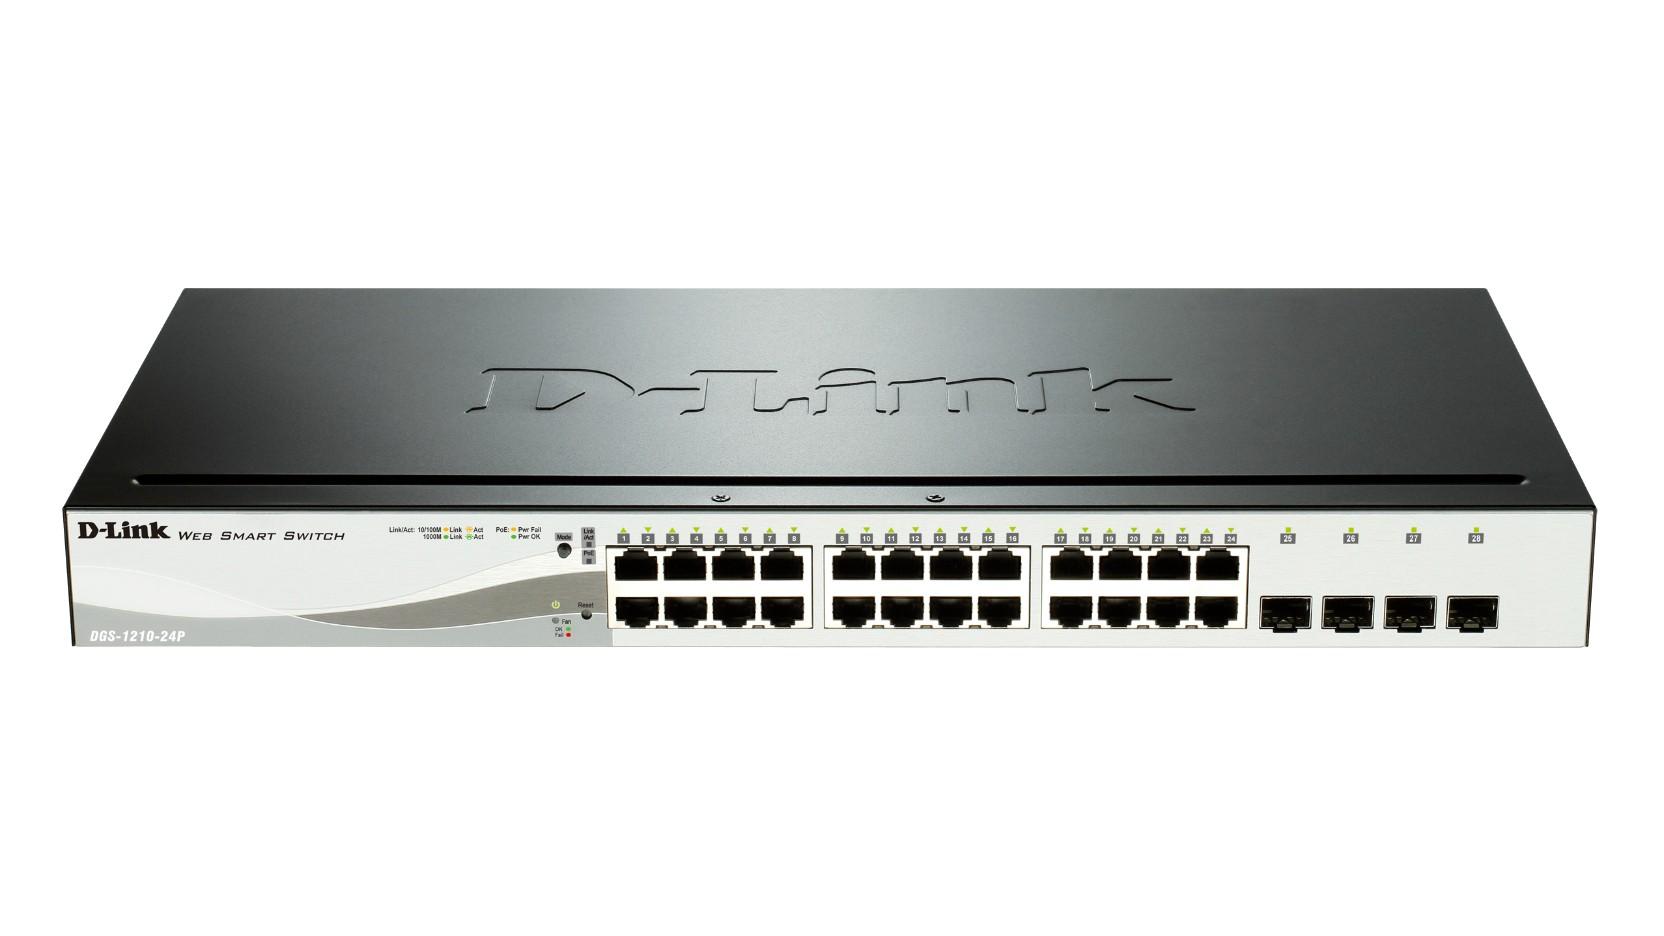 D-Link DGS-1210-24P 24 Port PoE Gigabit Switch with 4 SFP Ports